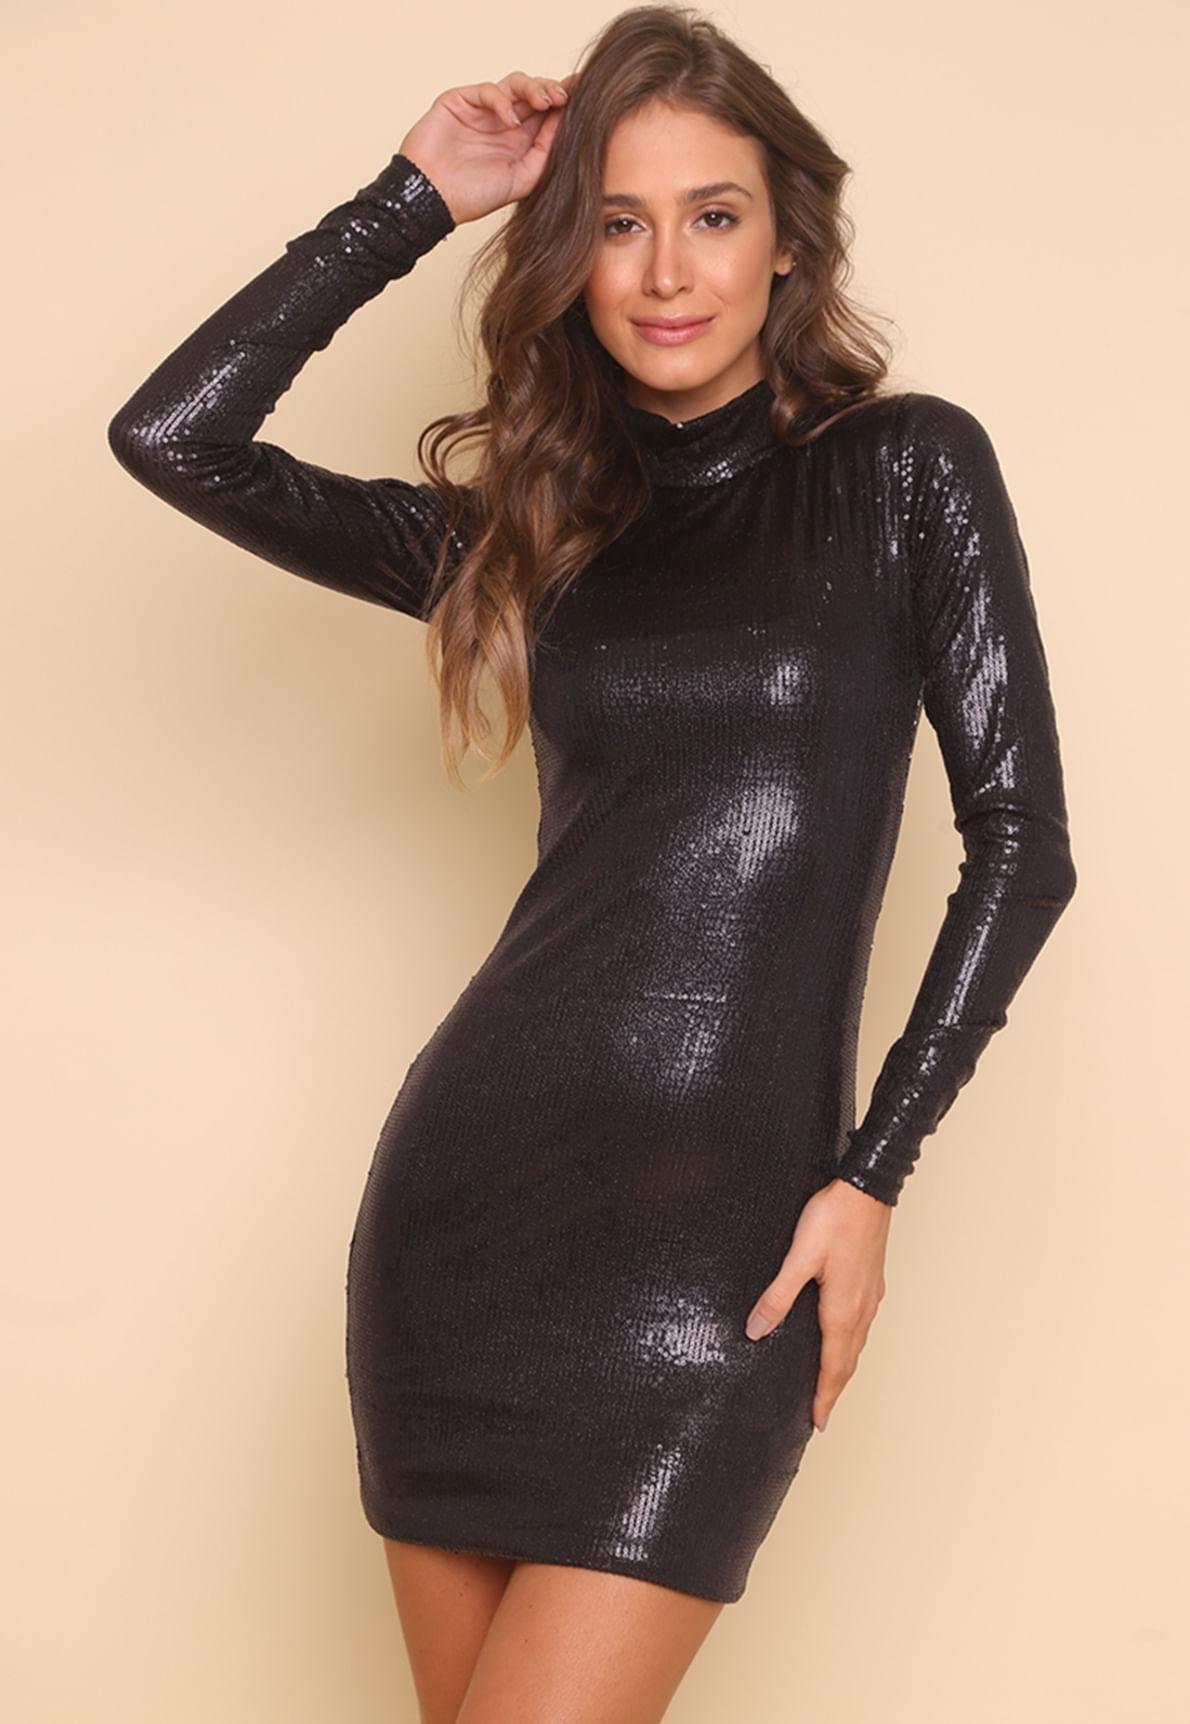 28622-vestido-maga-longa-preto-paola-mundo-lolita-02